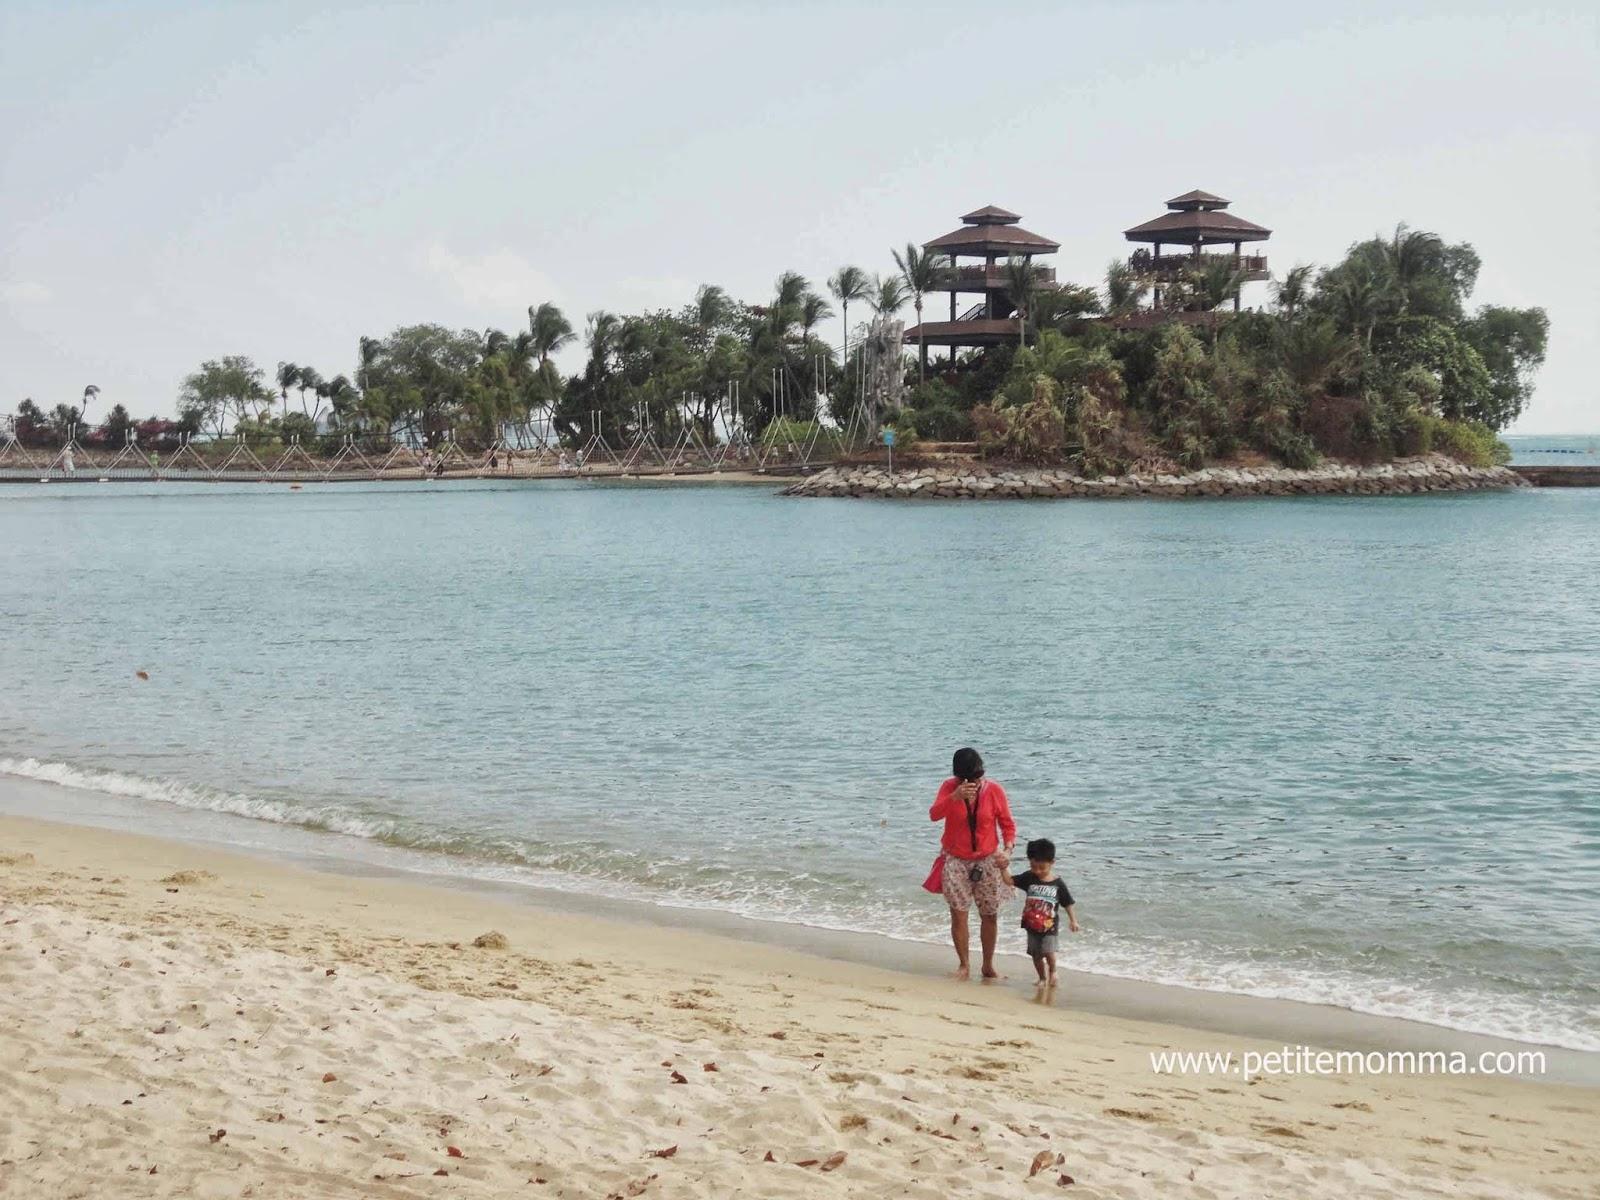 palawan beach front